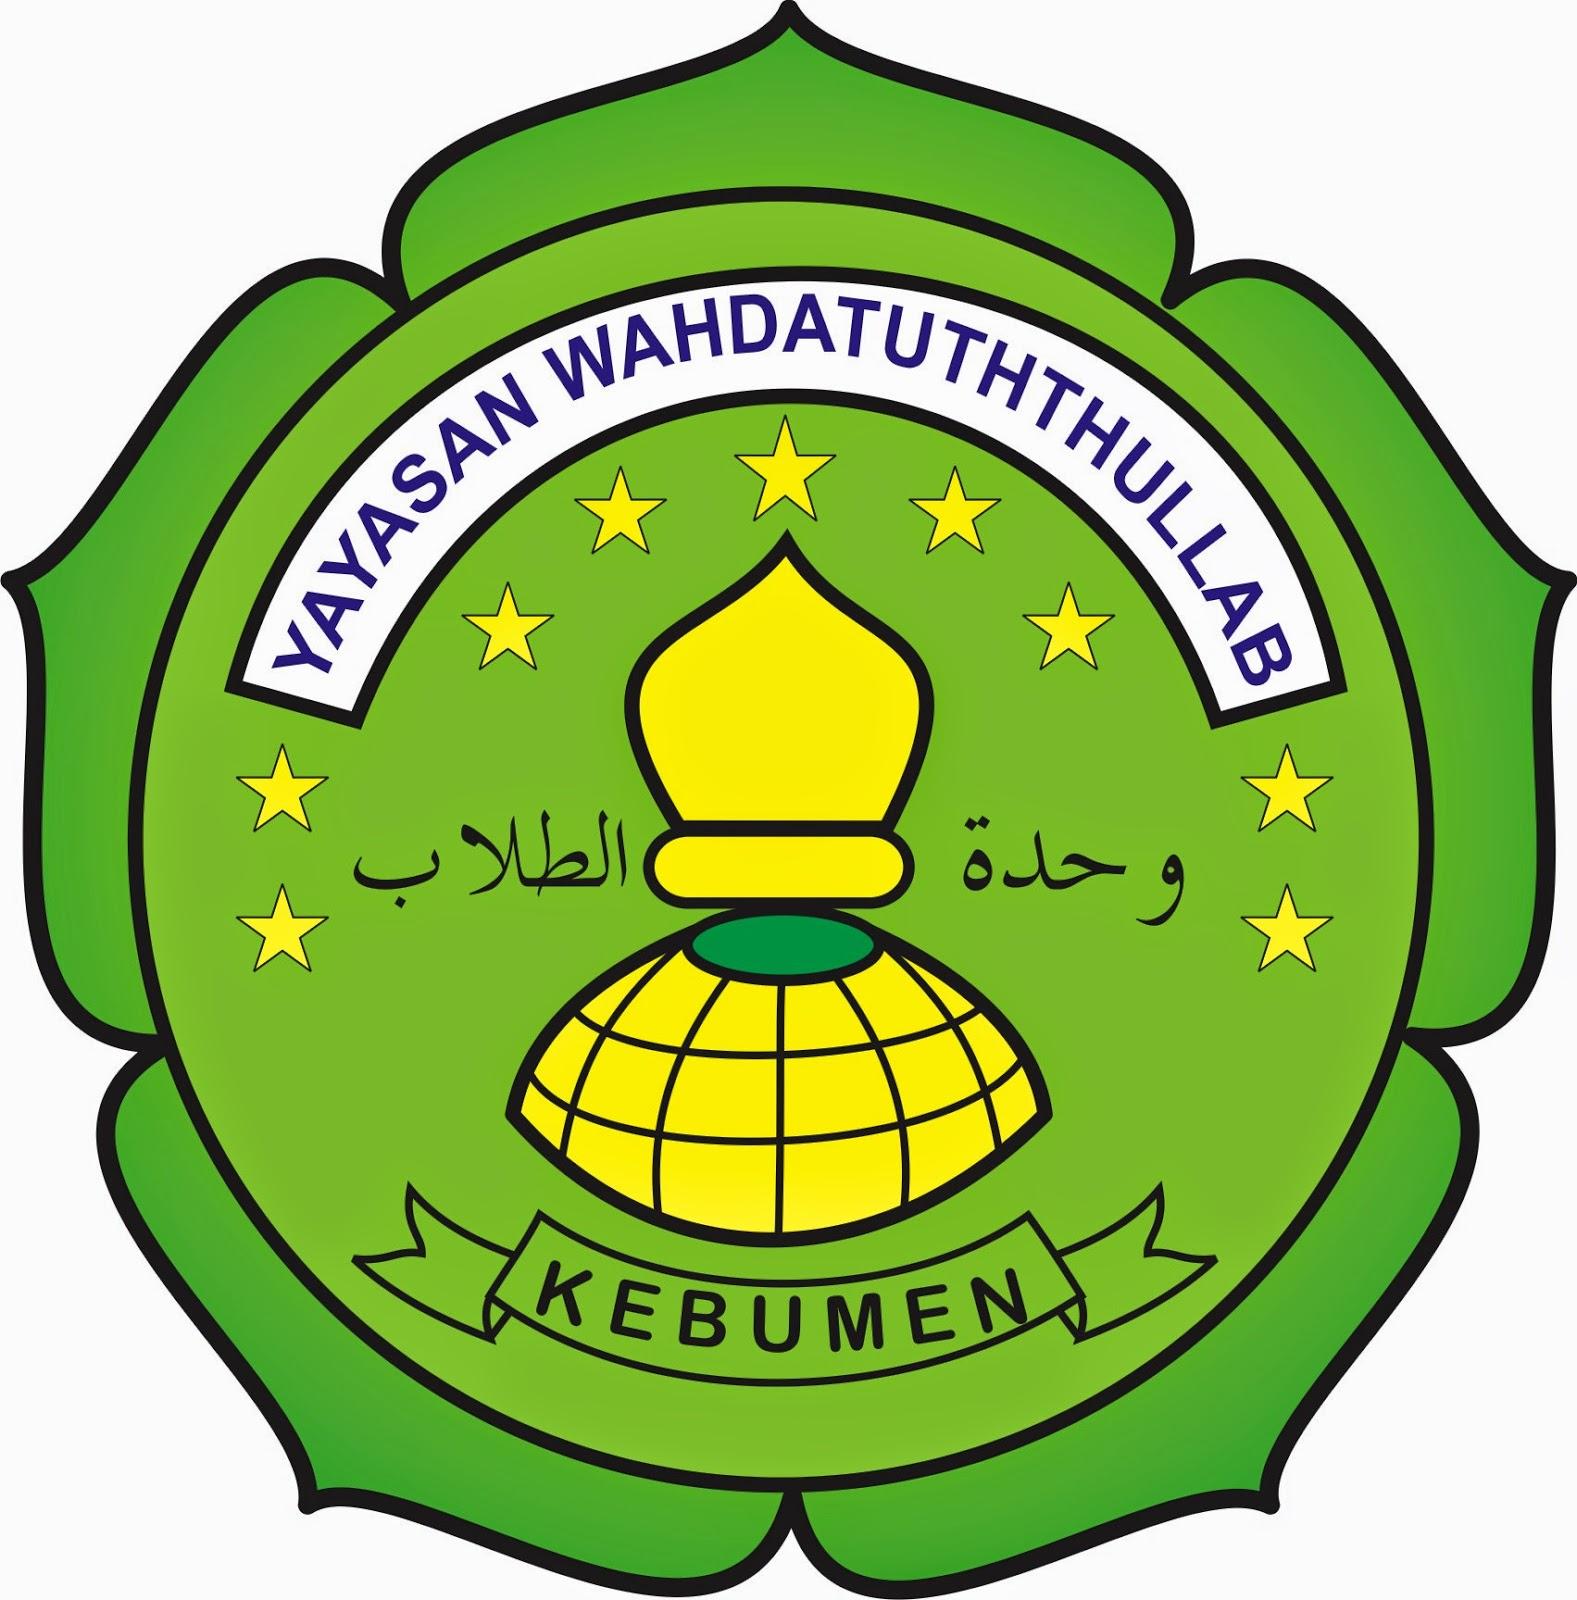 Contoh Gambar Logo Yayasan